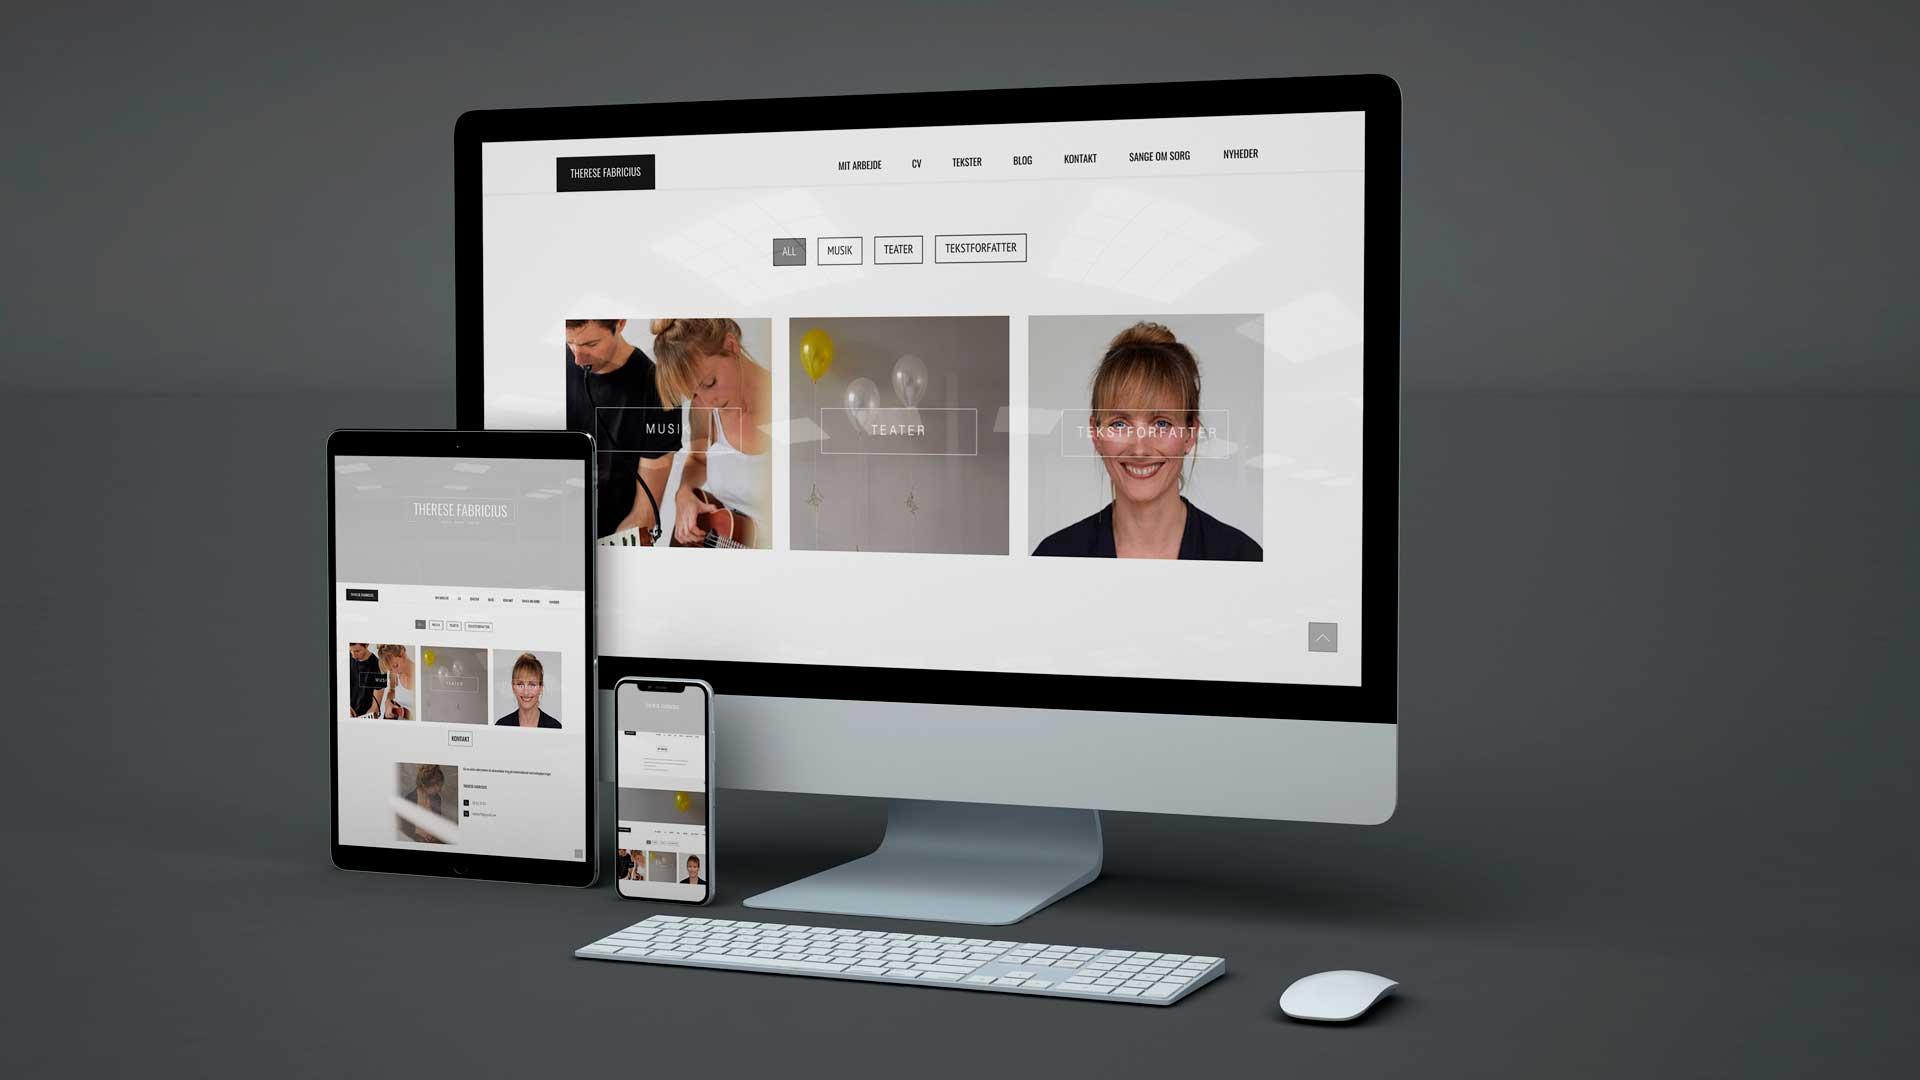 responsiv web design